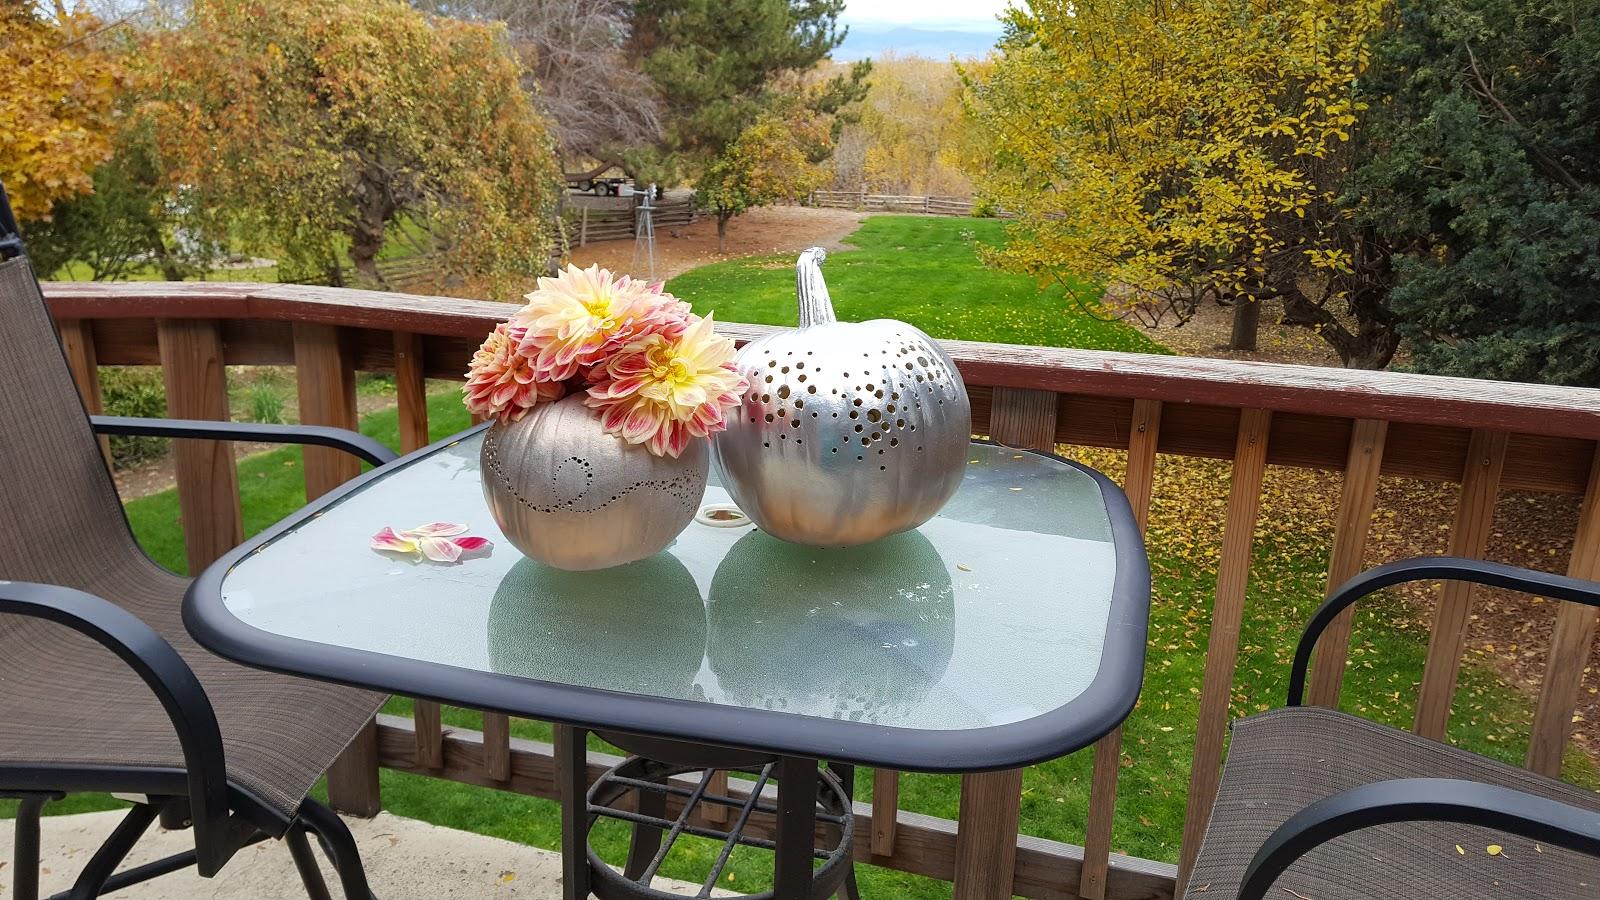 diy metallic painted pumpkins drilled